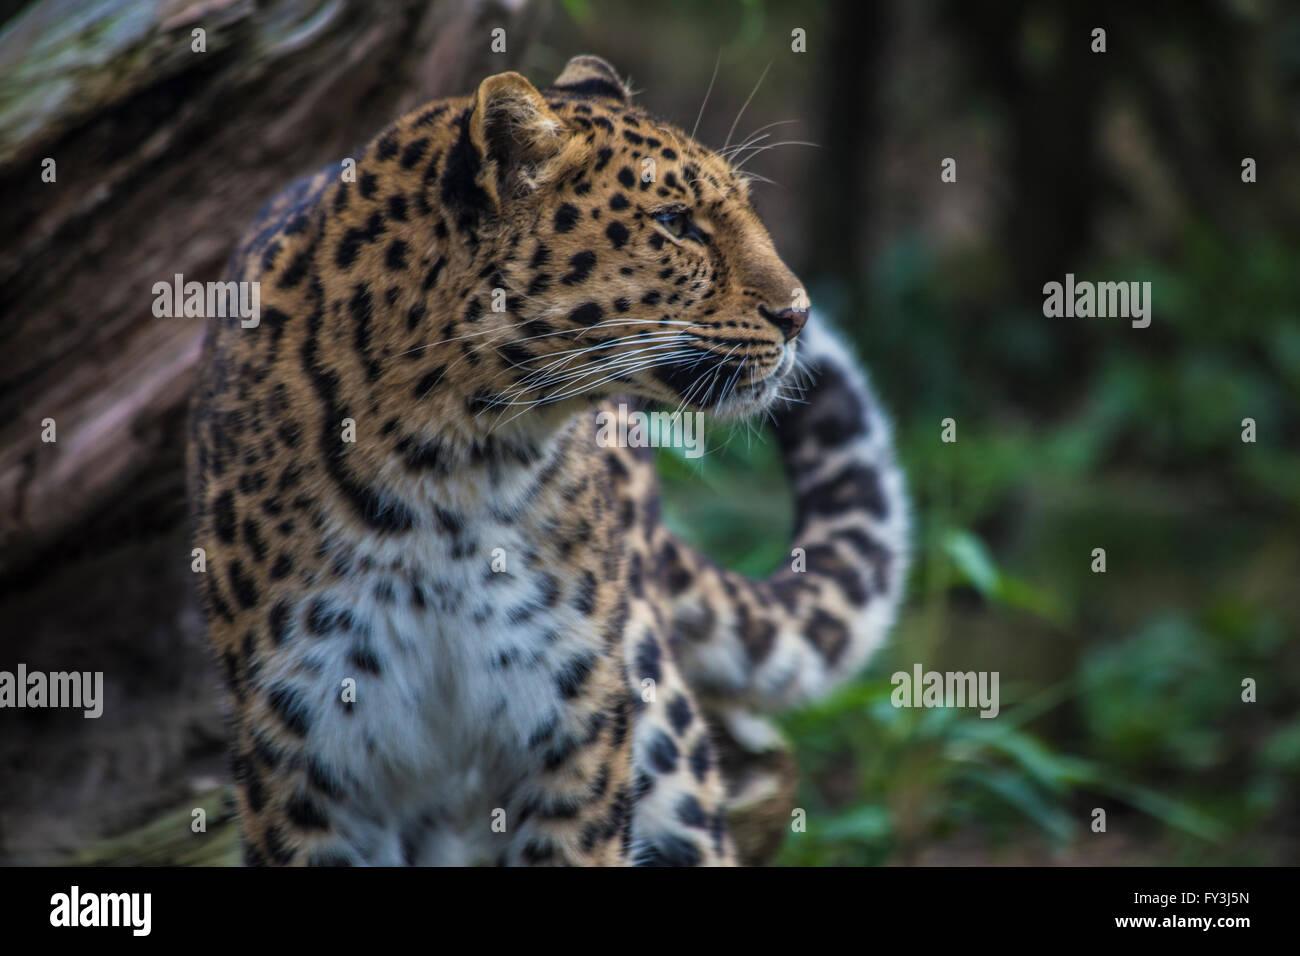 Amur Leopard (Panthera pardus orientalis) Looking Right - Stock Image